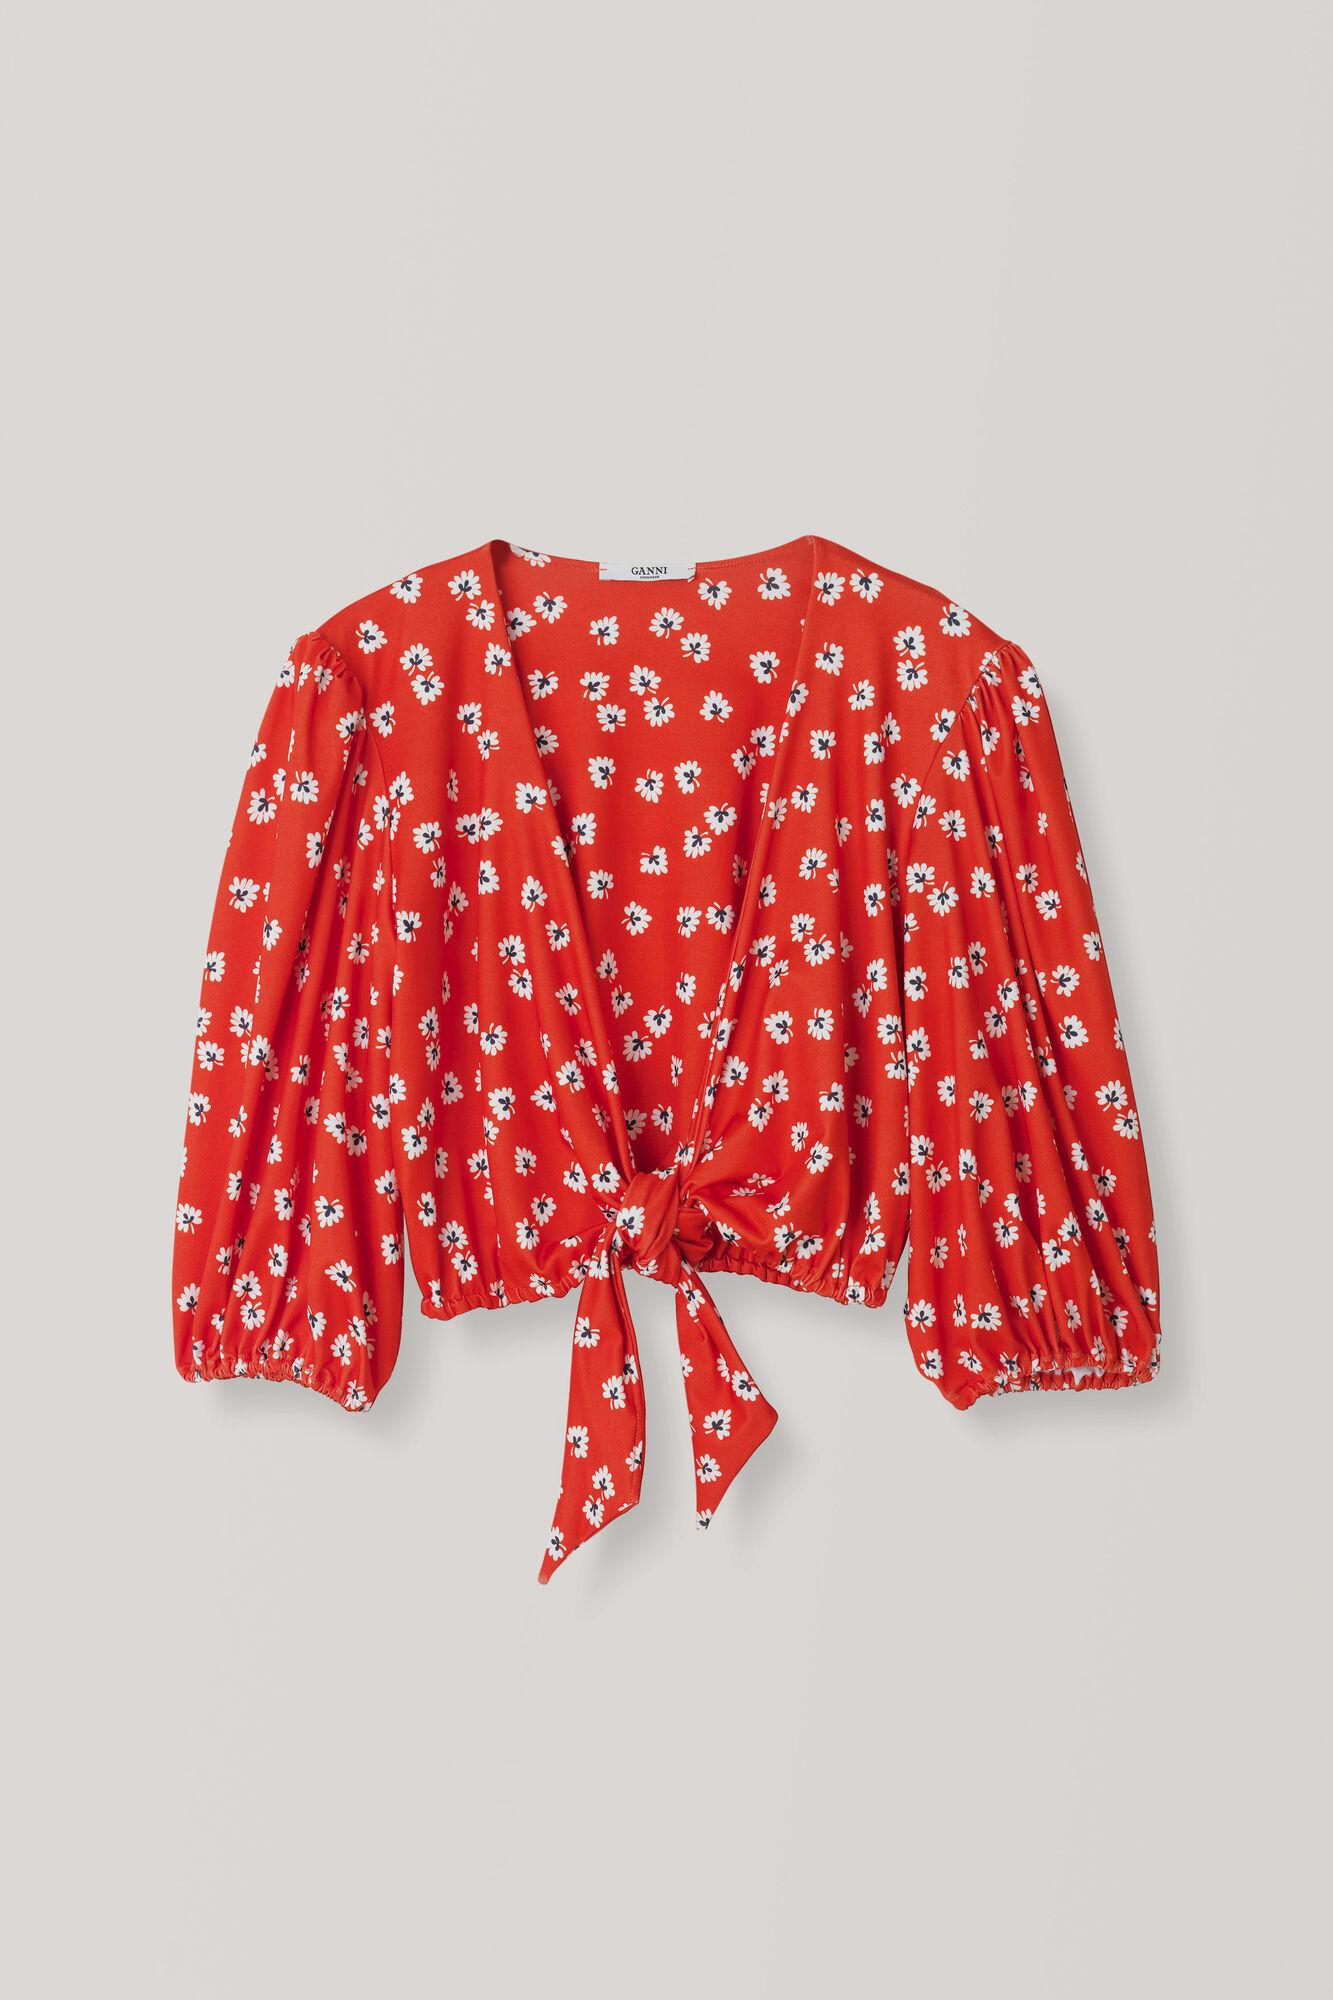 Columbine Swimwear Top, Big Apple Red, hi-res